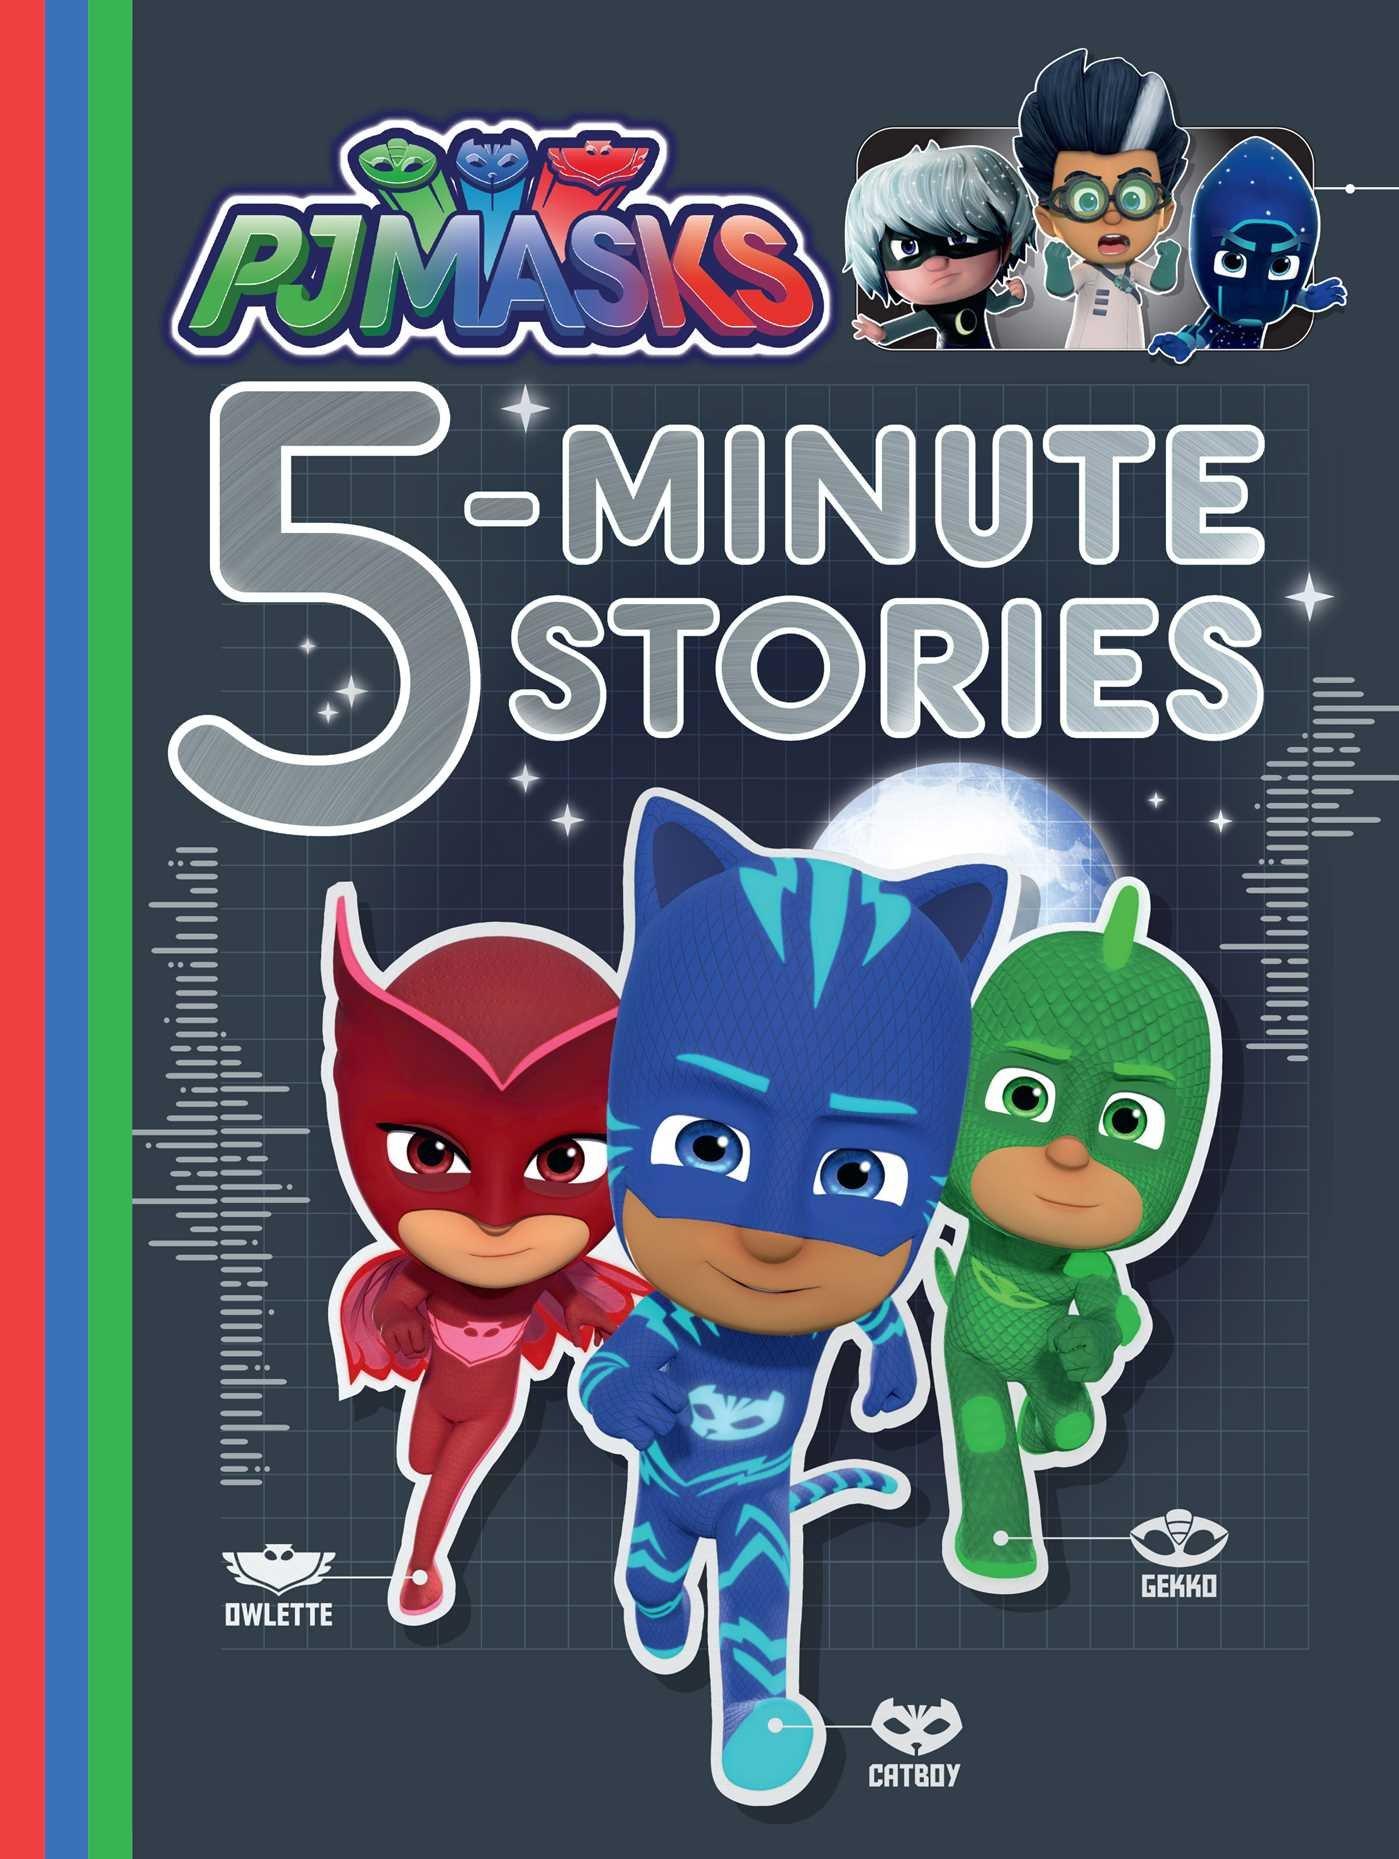 Pj Masks 5-Minute Stories : Various: Amazon.es: Libros